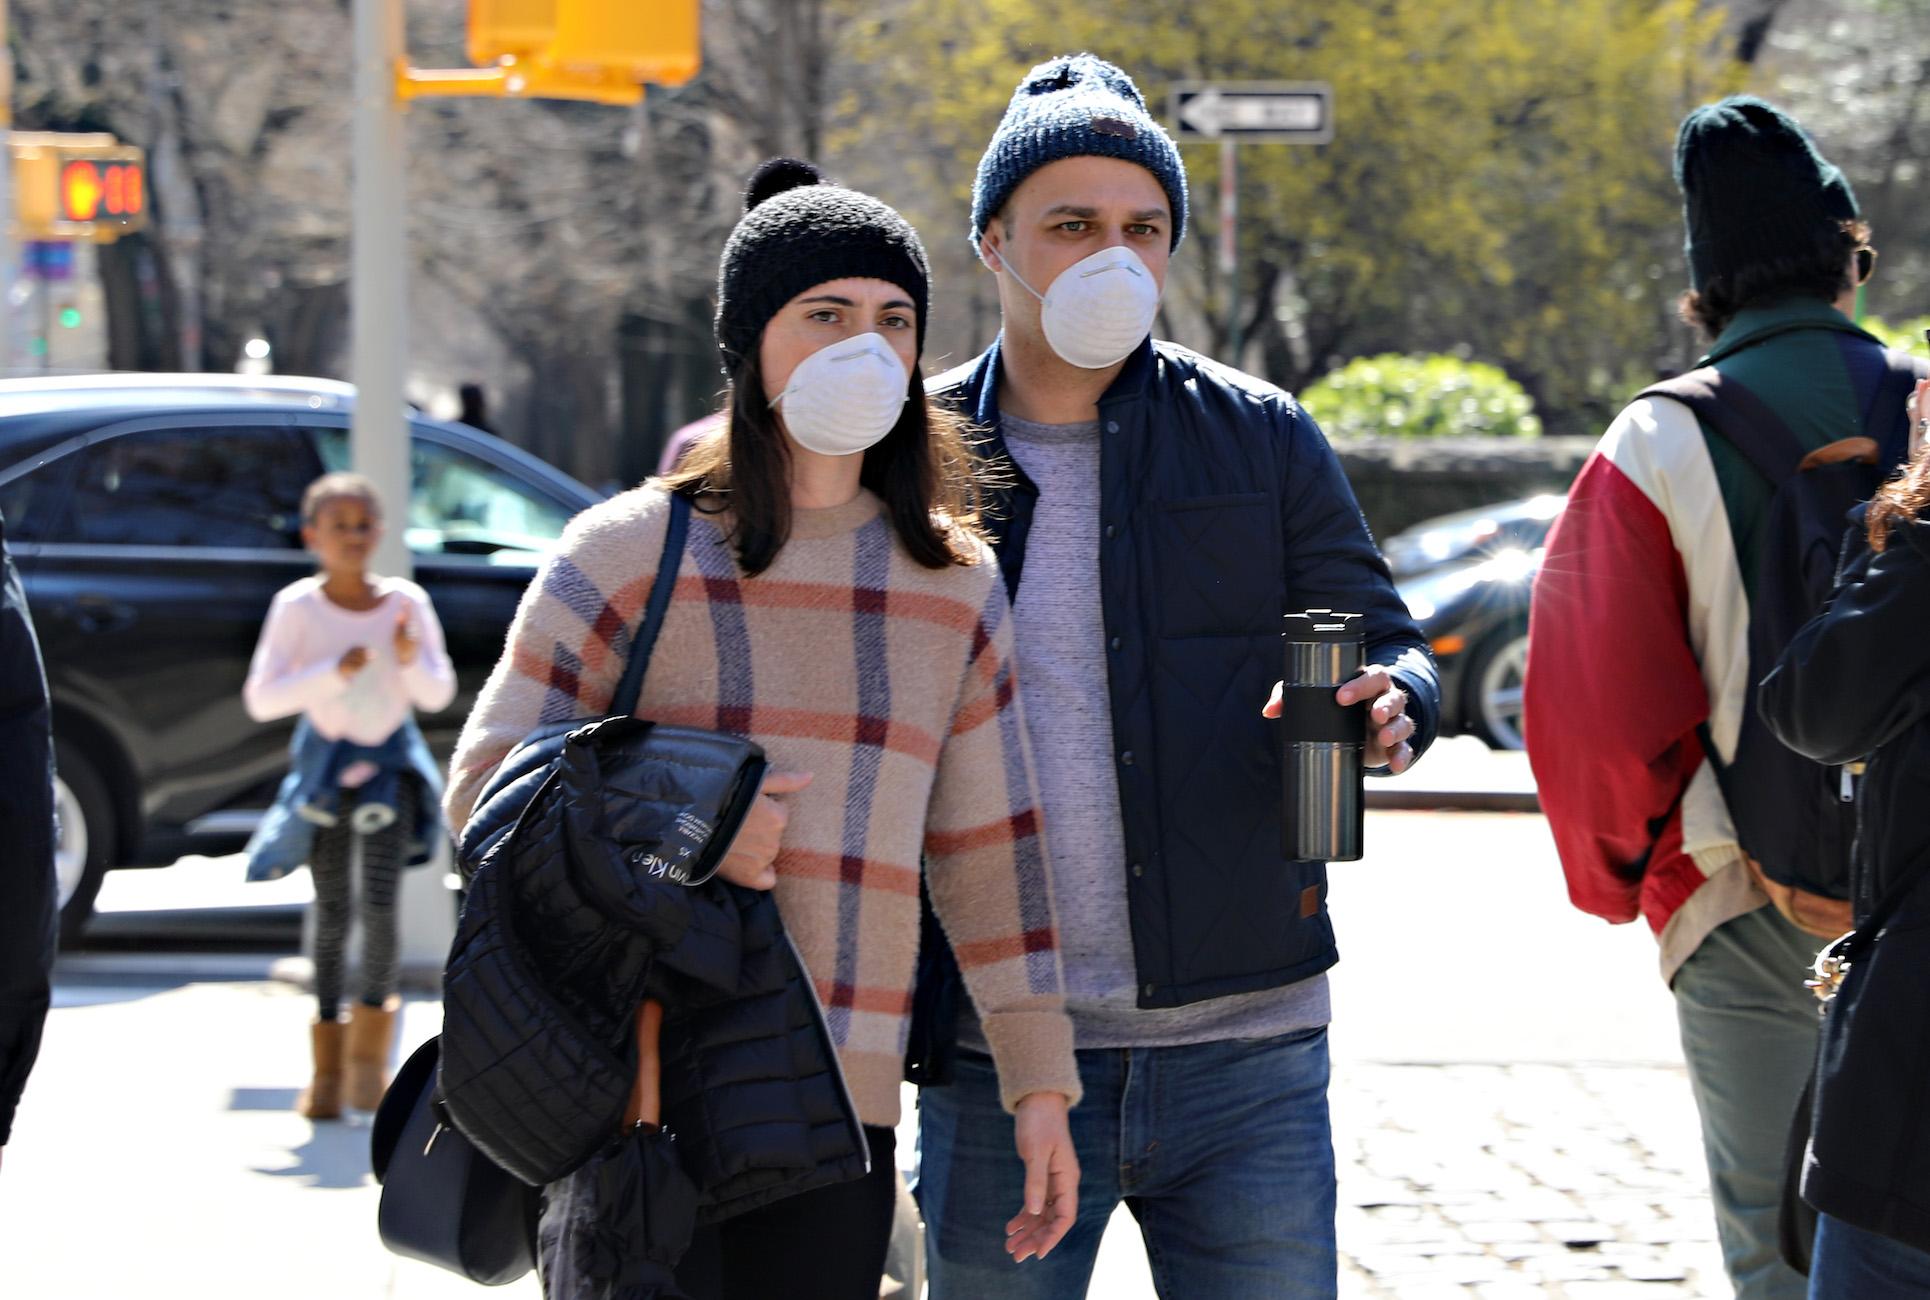 New York City Institutions Close To Public Amid Coronavirus Scare